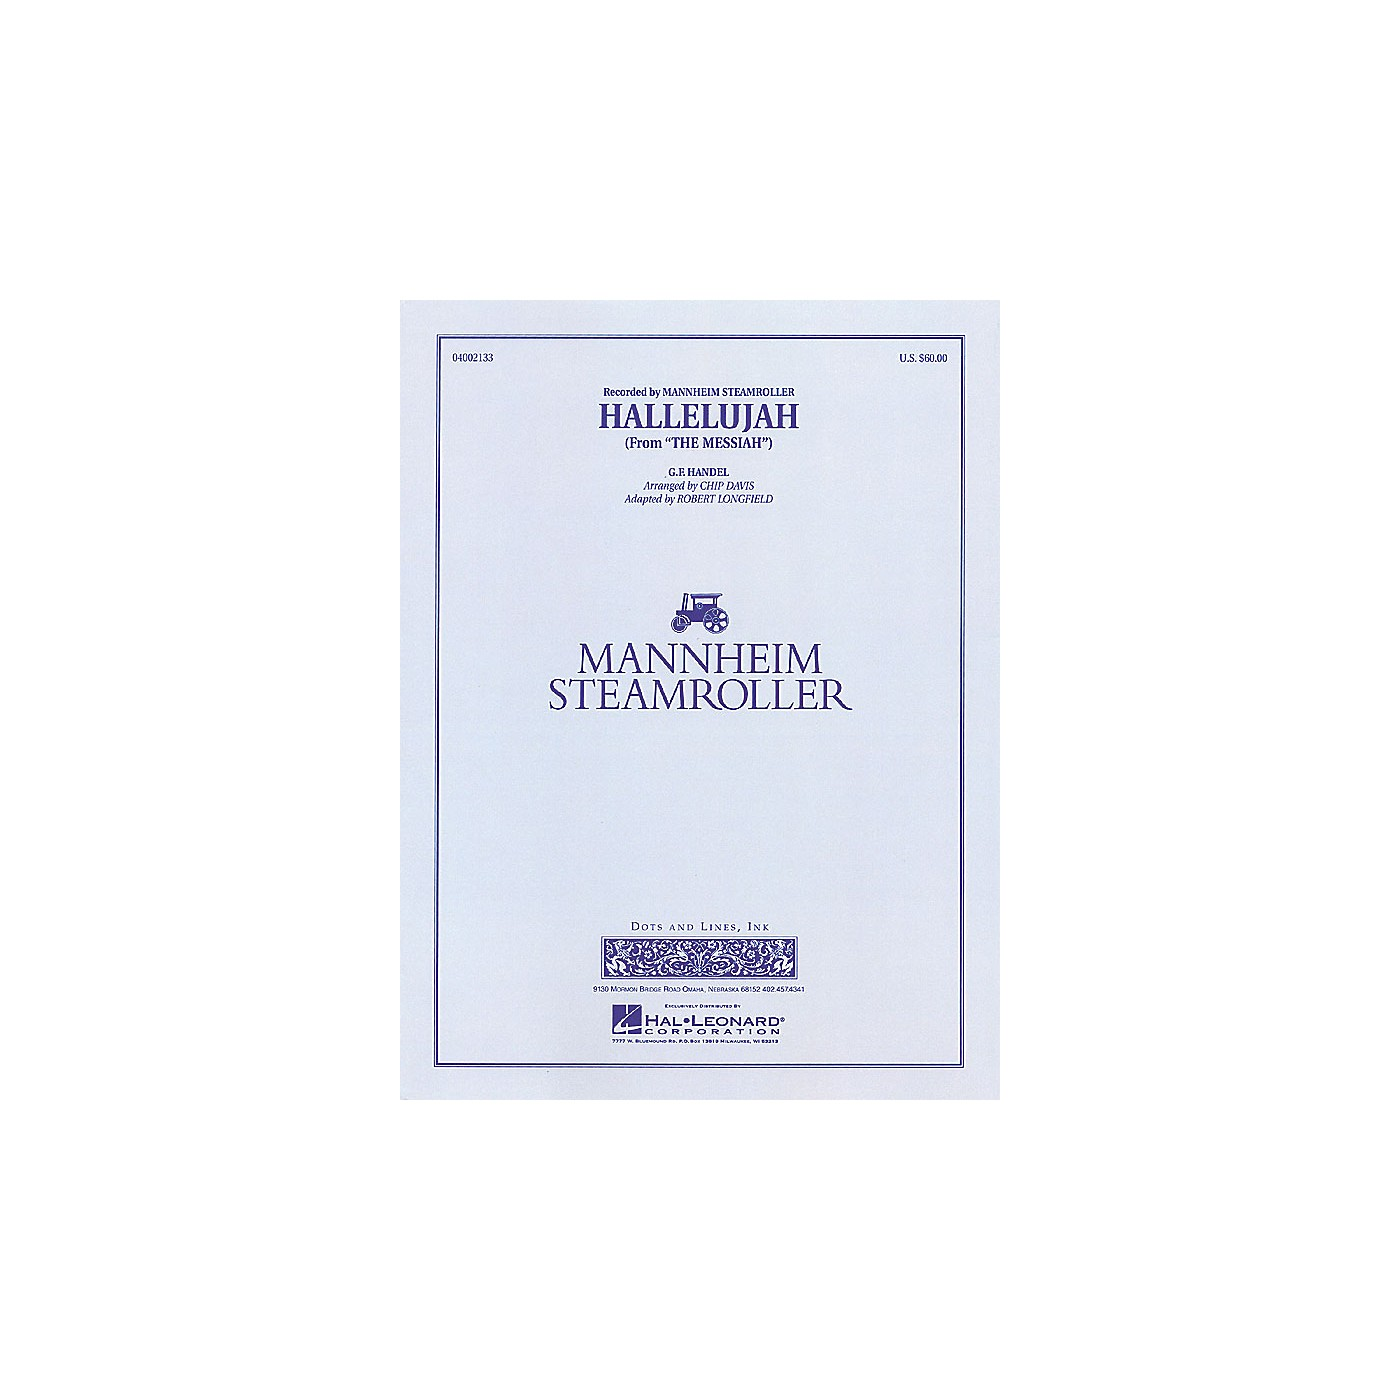 Hal Leonard Hallelujah Concert Band Level 3-4 by Mannheim Steamroller Arranged by Chip Davis thumbnail